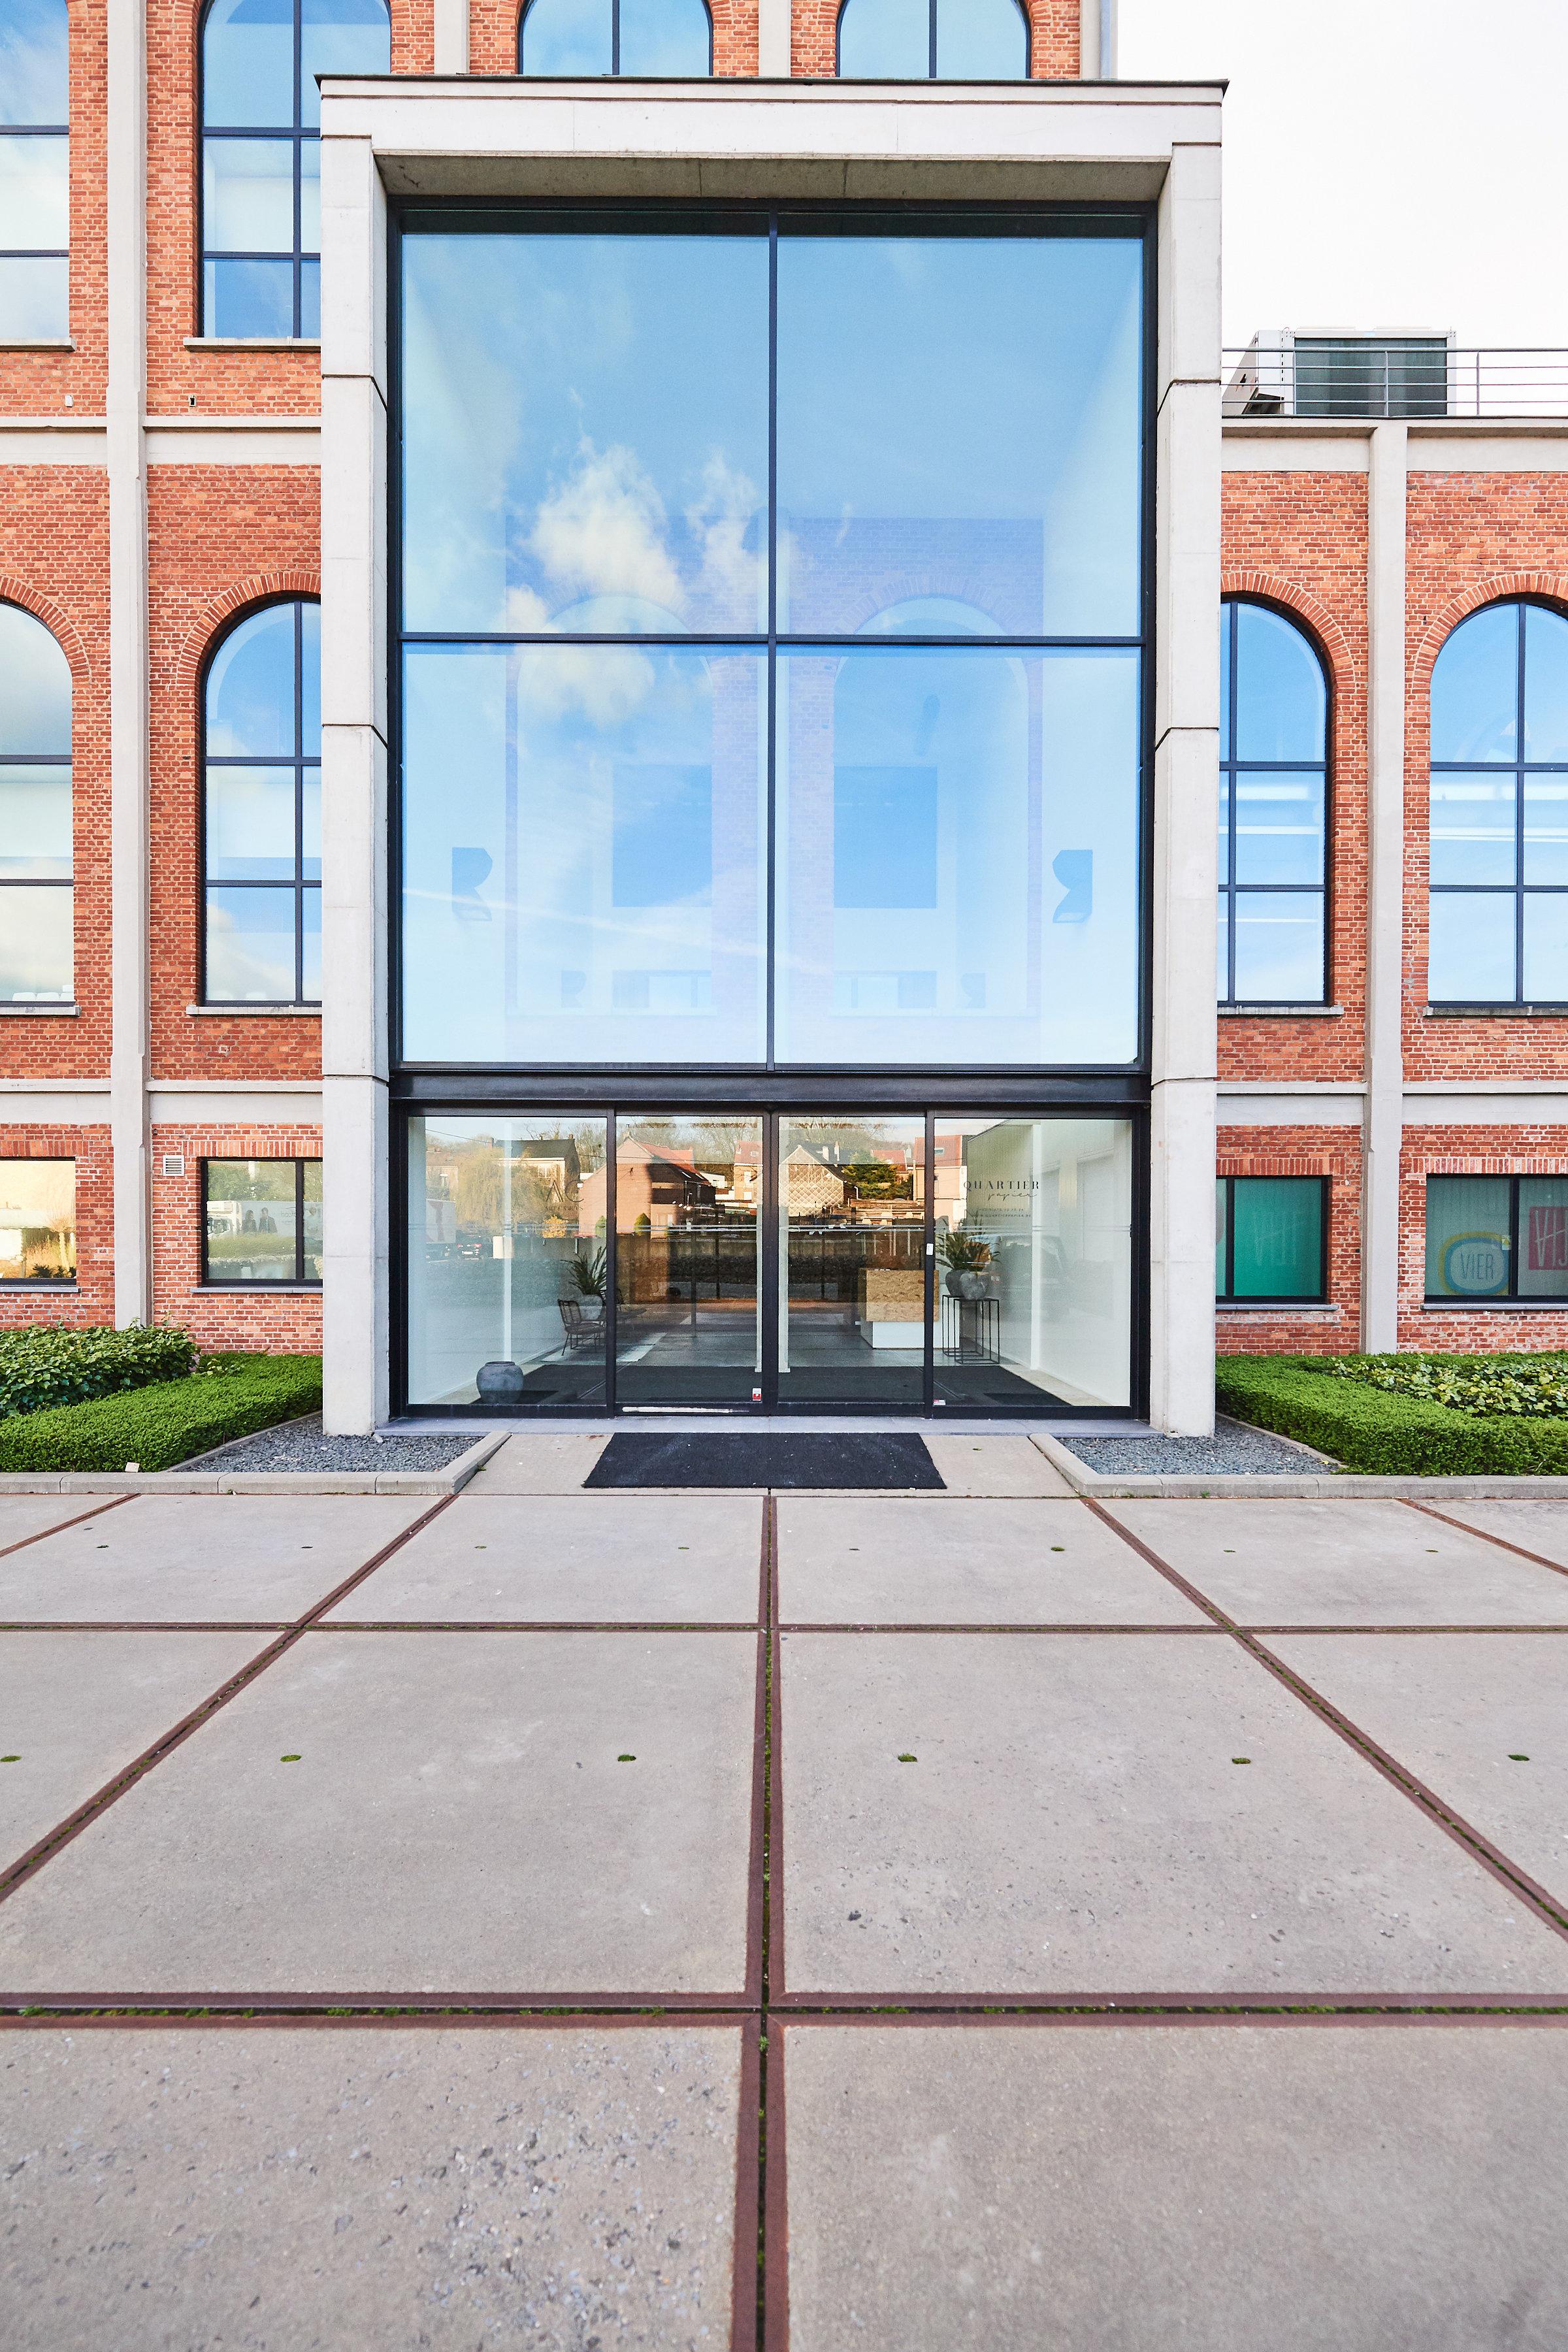 Entrance - Outside view